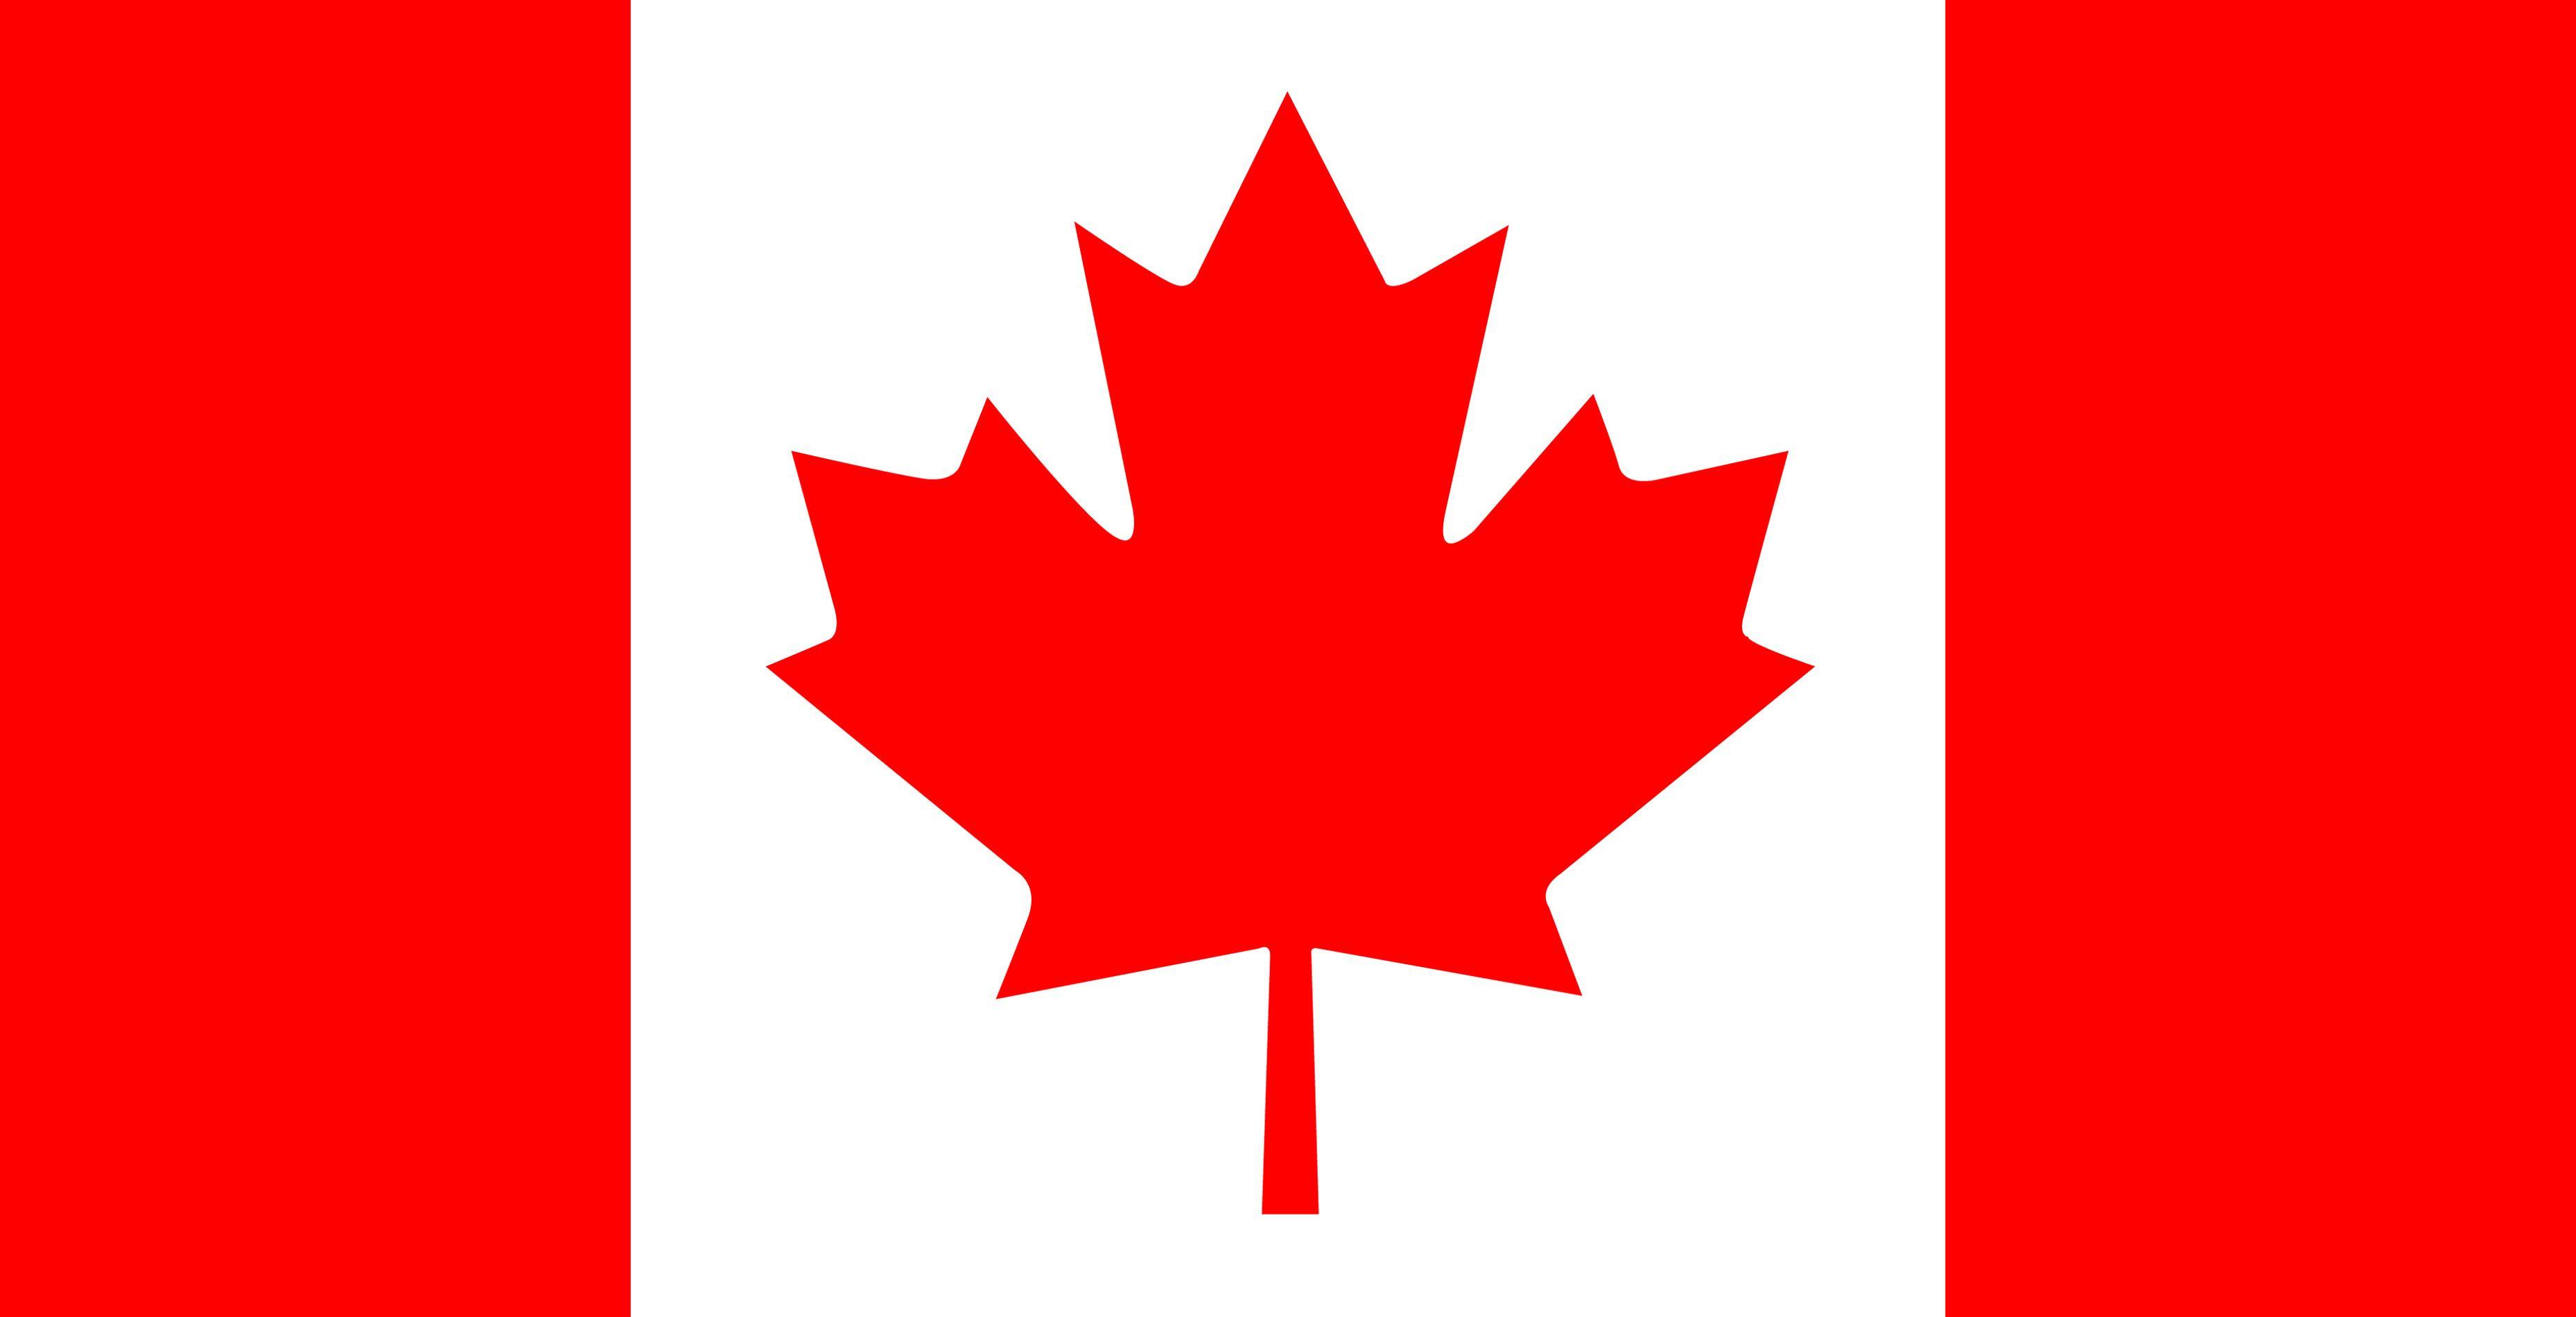 Born And Raised Vlag Van Canada Vlag Vlaggen